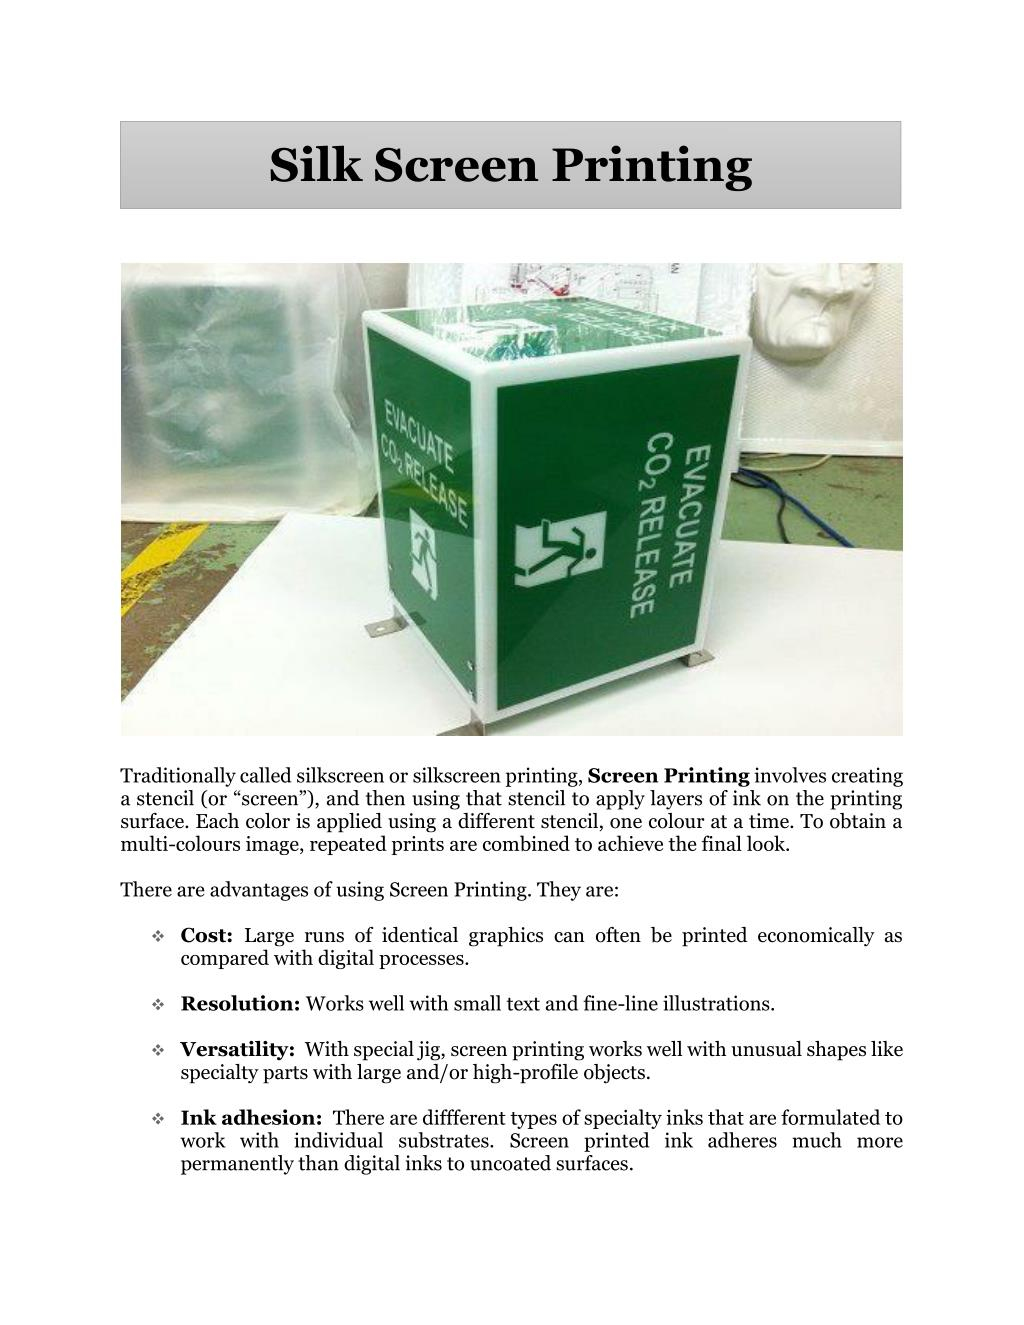 ppt silk screen printing powerpoint presentation id 7566558